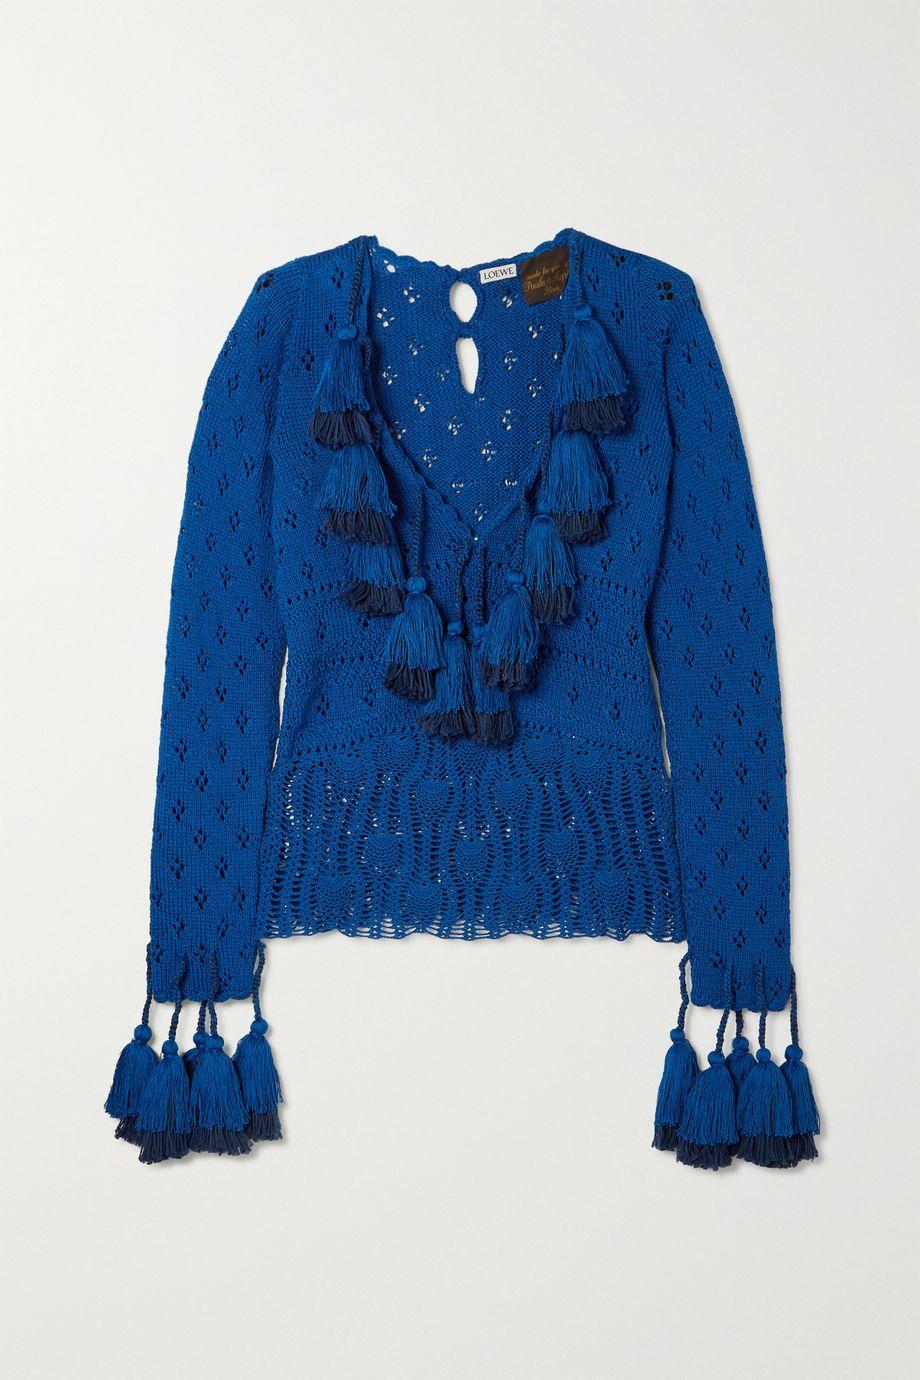 Loewe Tasseled pointelle-knit cotton sweater